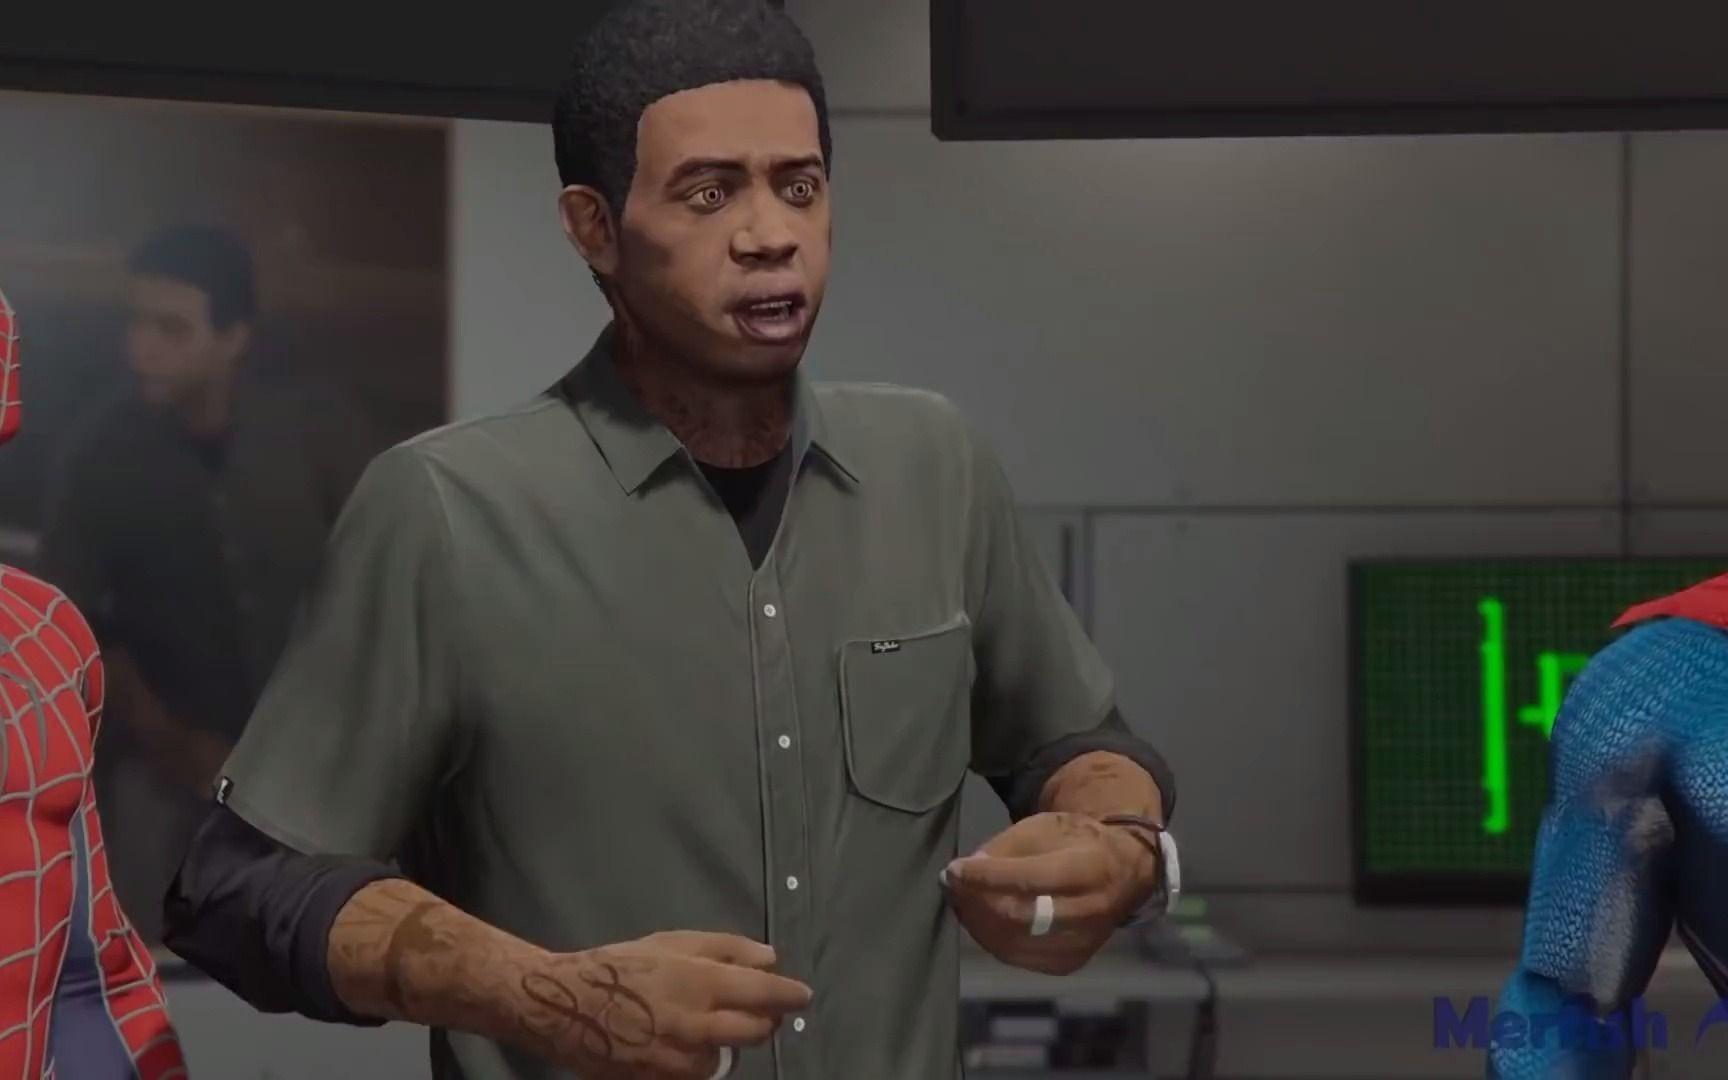 【GTA5】洛圣都拉玛嘲讽研究所【Merfish】